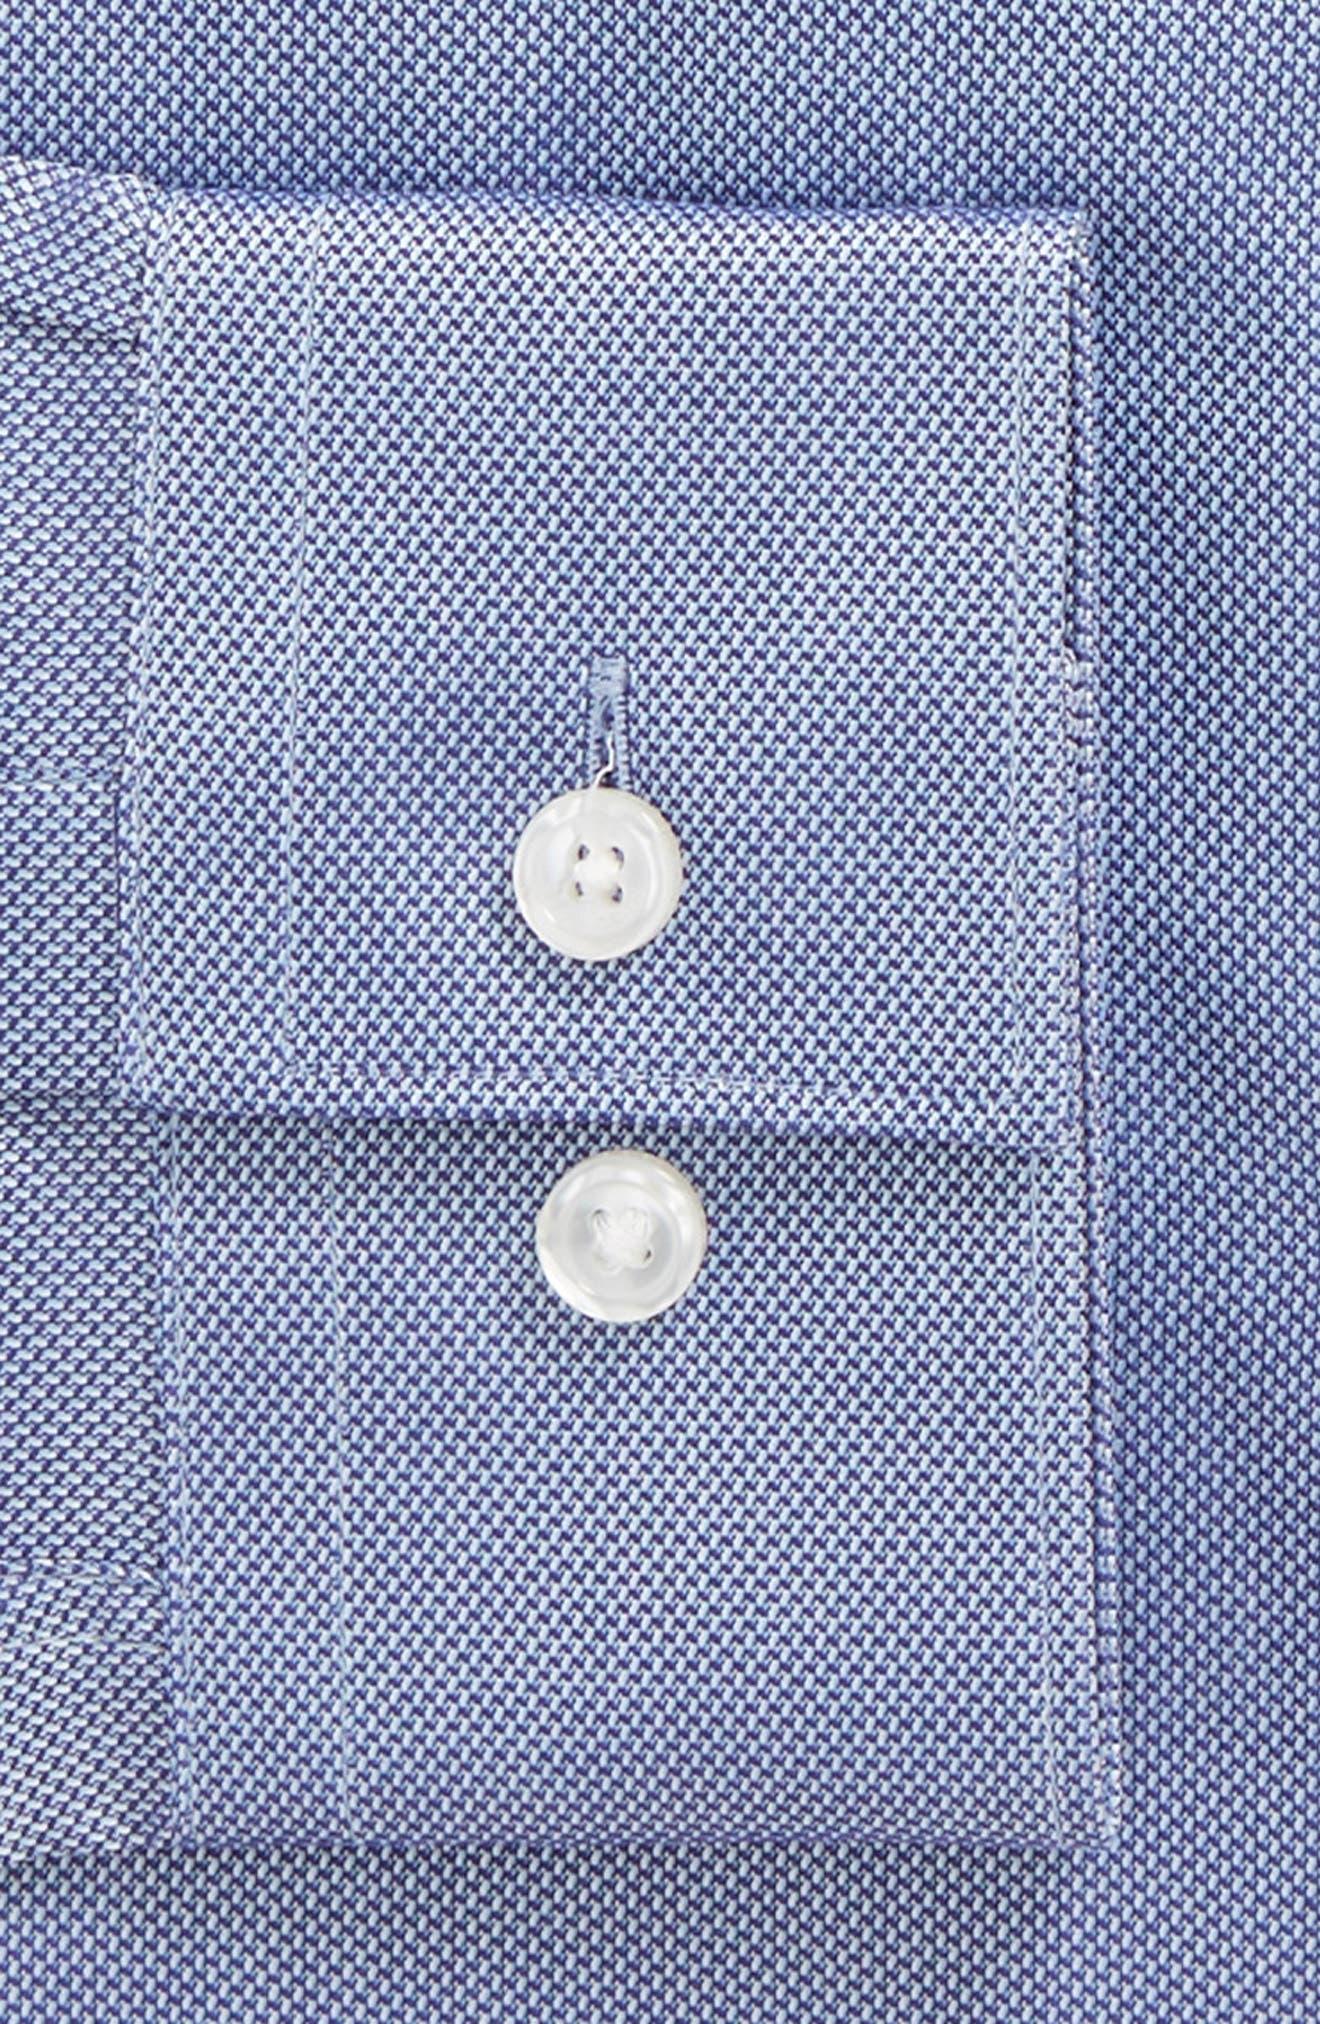 Nordstrom x BOSS Isaak Slim Fit Solid Dress Shirt,                             Alternate thumbnail 2, color,                             420